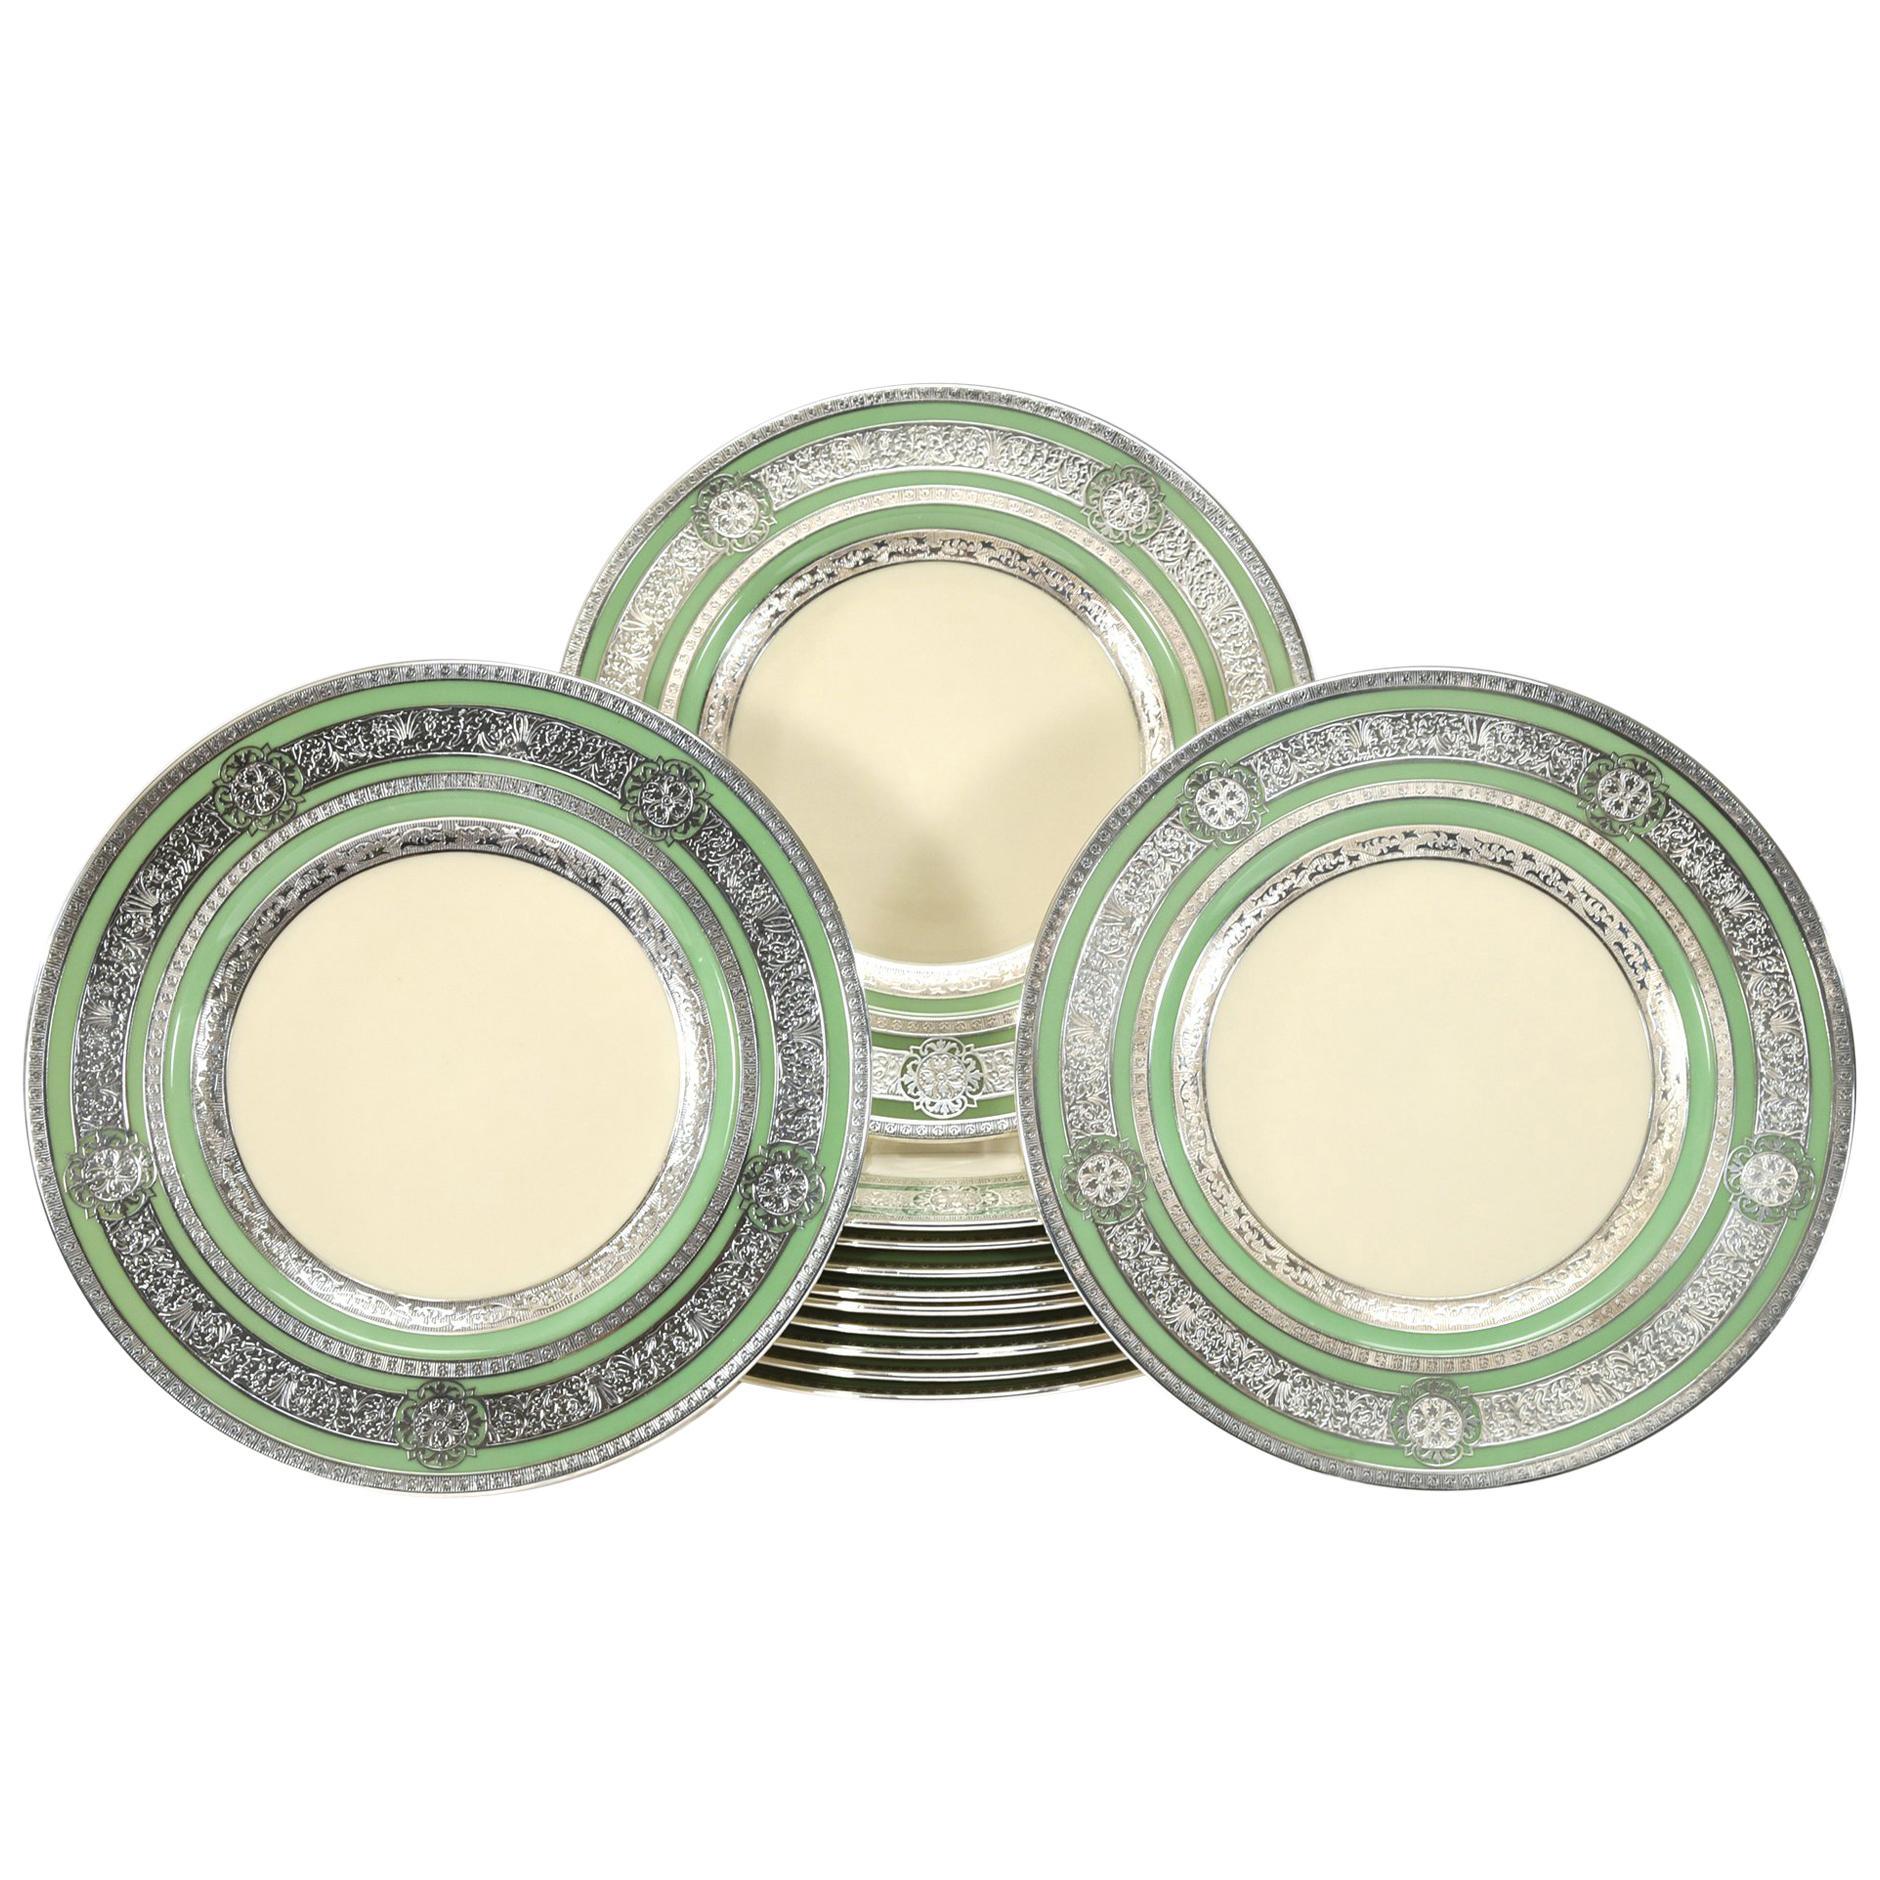 12 Morgan Belleek Sterling Silver Overlay Dinner or Service Plates